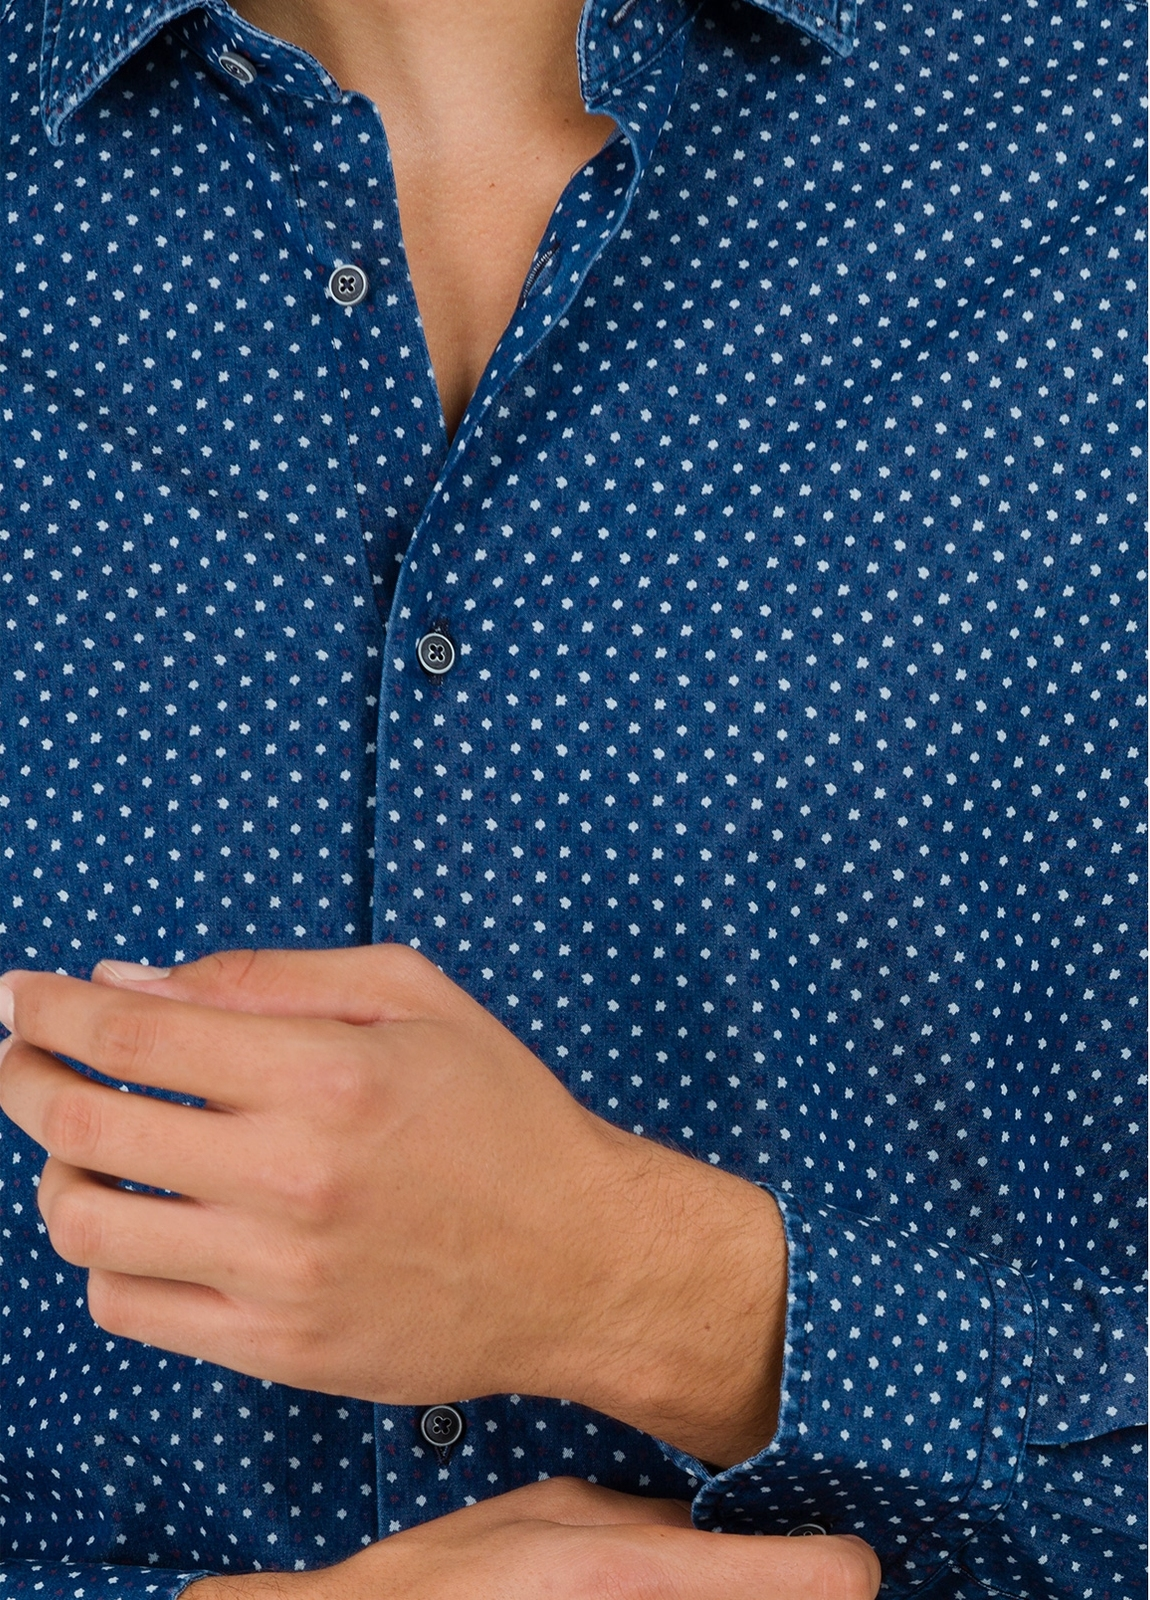 Camisa Leisure Wear SLIM FIT modelo PORTO microdibujo floral, color azul. 100% Algodón. - Ítem3